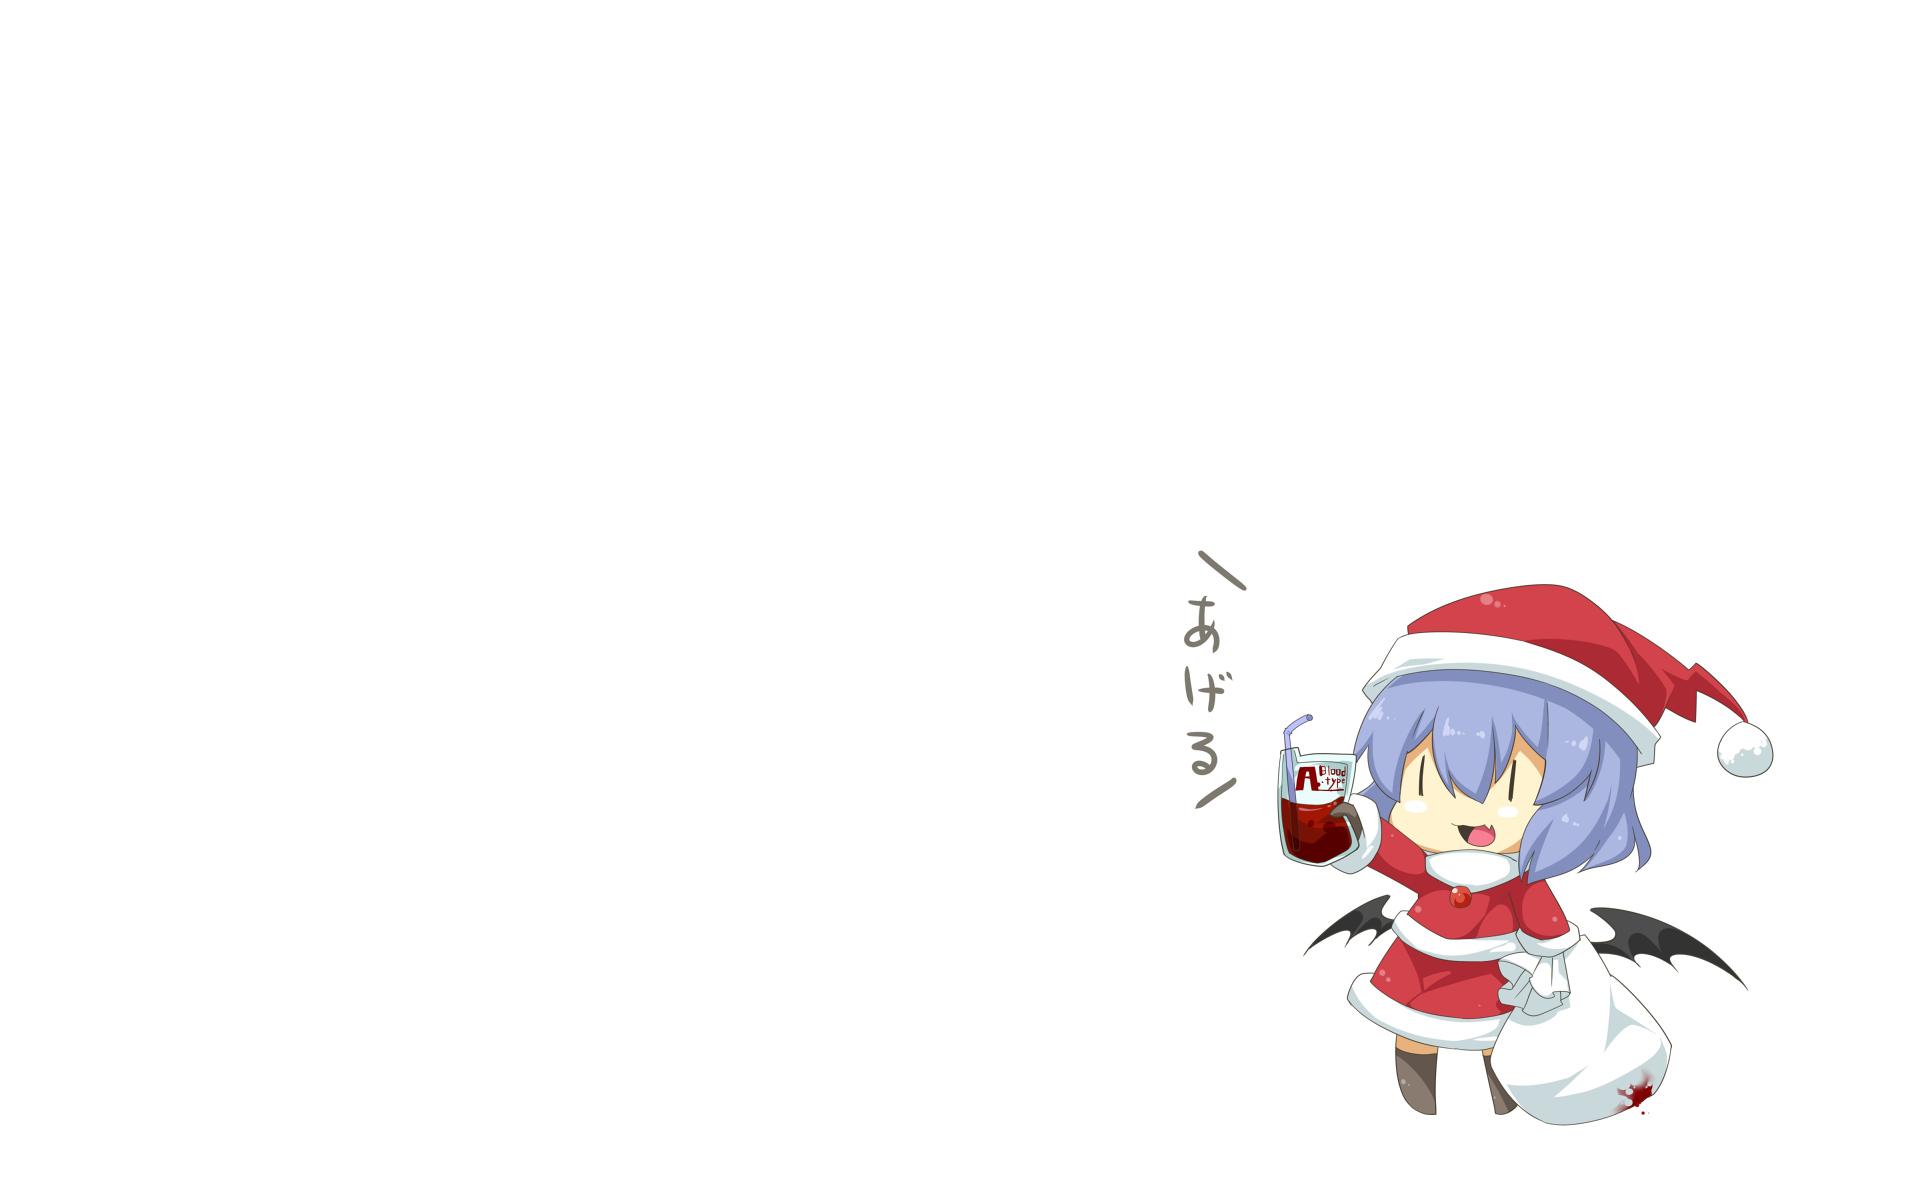 blood chibi christmas fang haipa_okara hat remilia_scarlet santa_costume santa_hat touhou vampire white wings